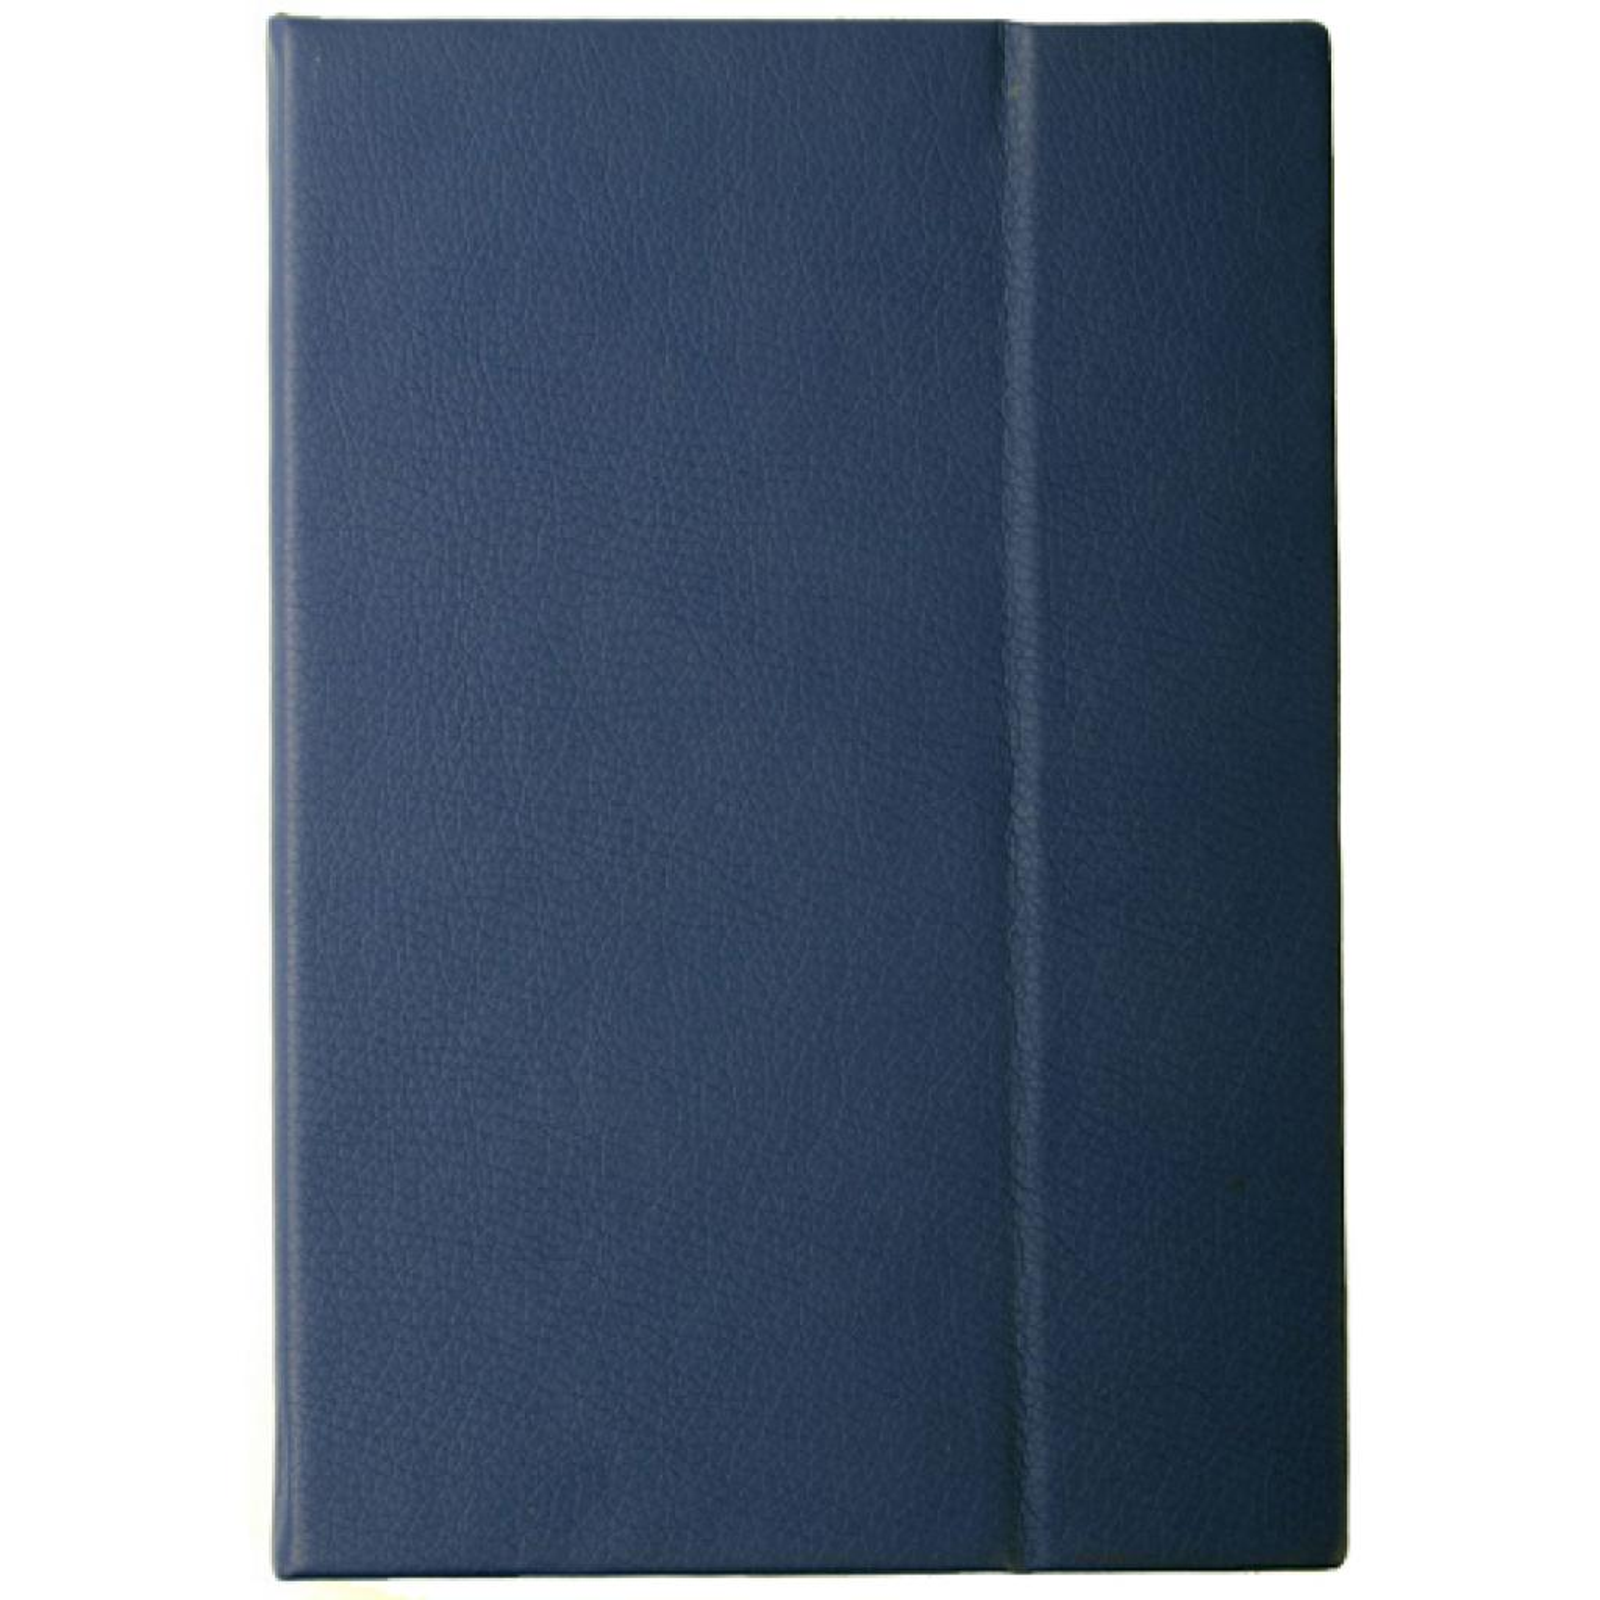 Чехол для планшета Vento 9 Desire Matt - dark blue изображение 2